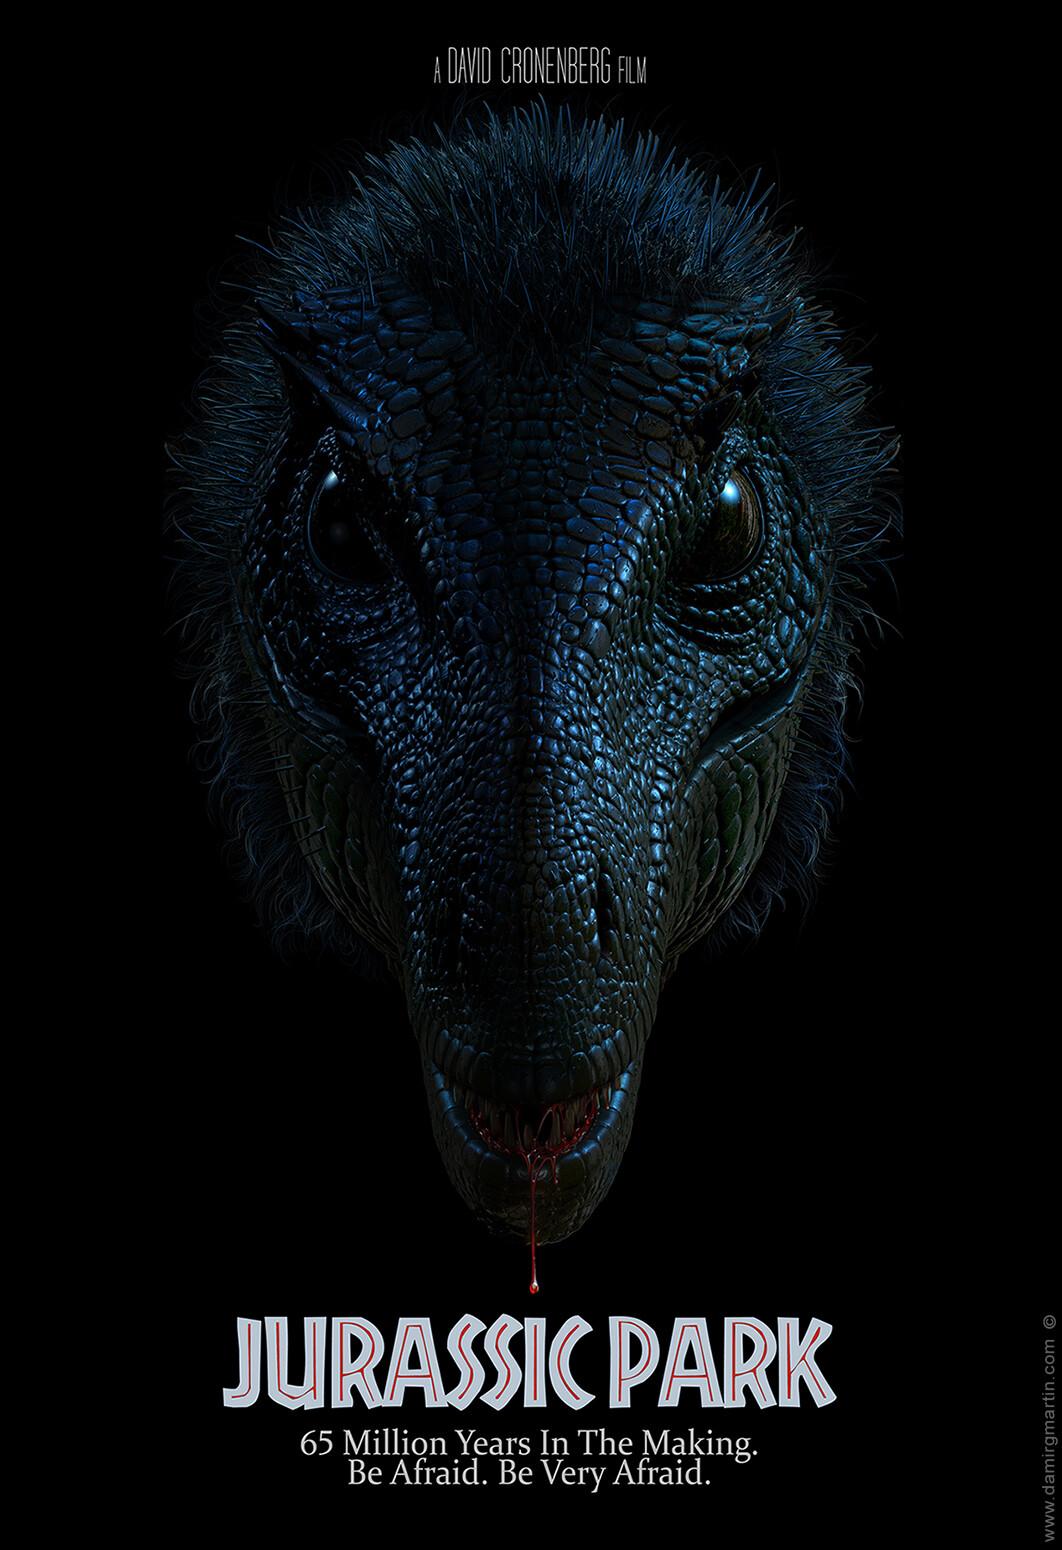 Jurassic Park Alternative Movie Poster